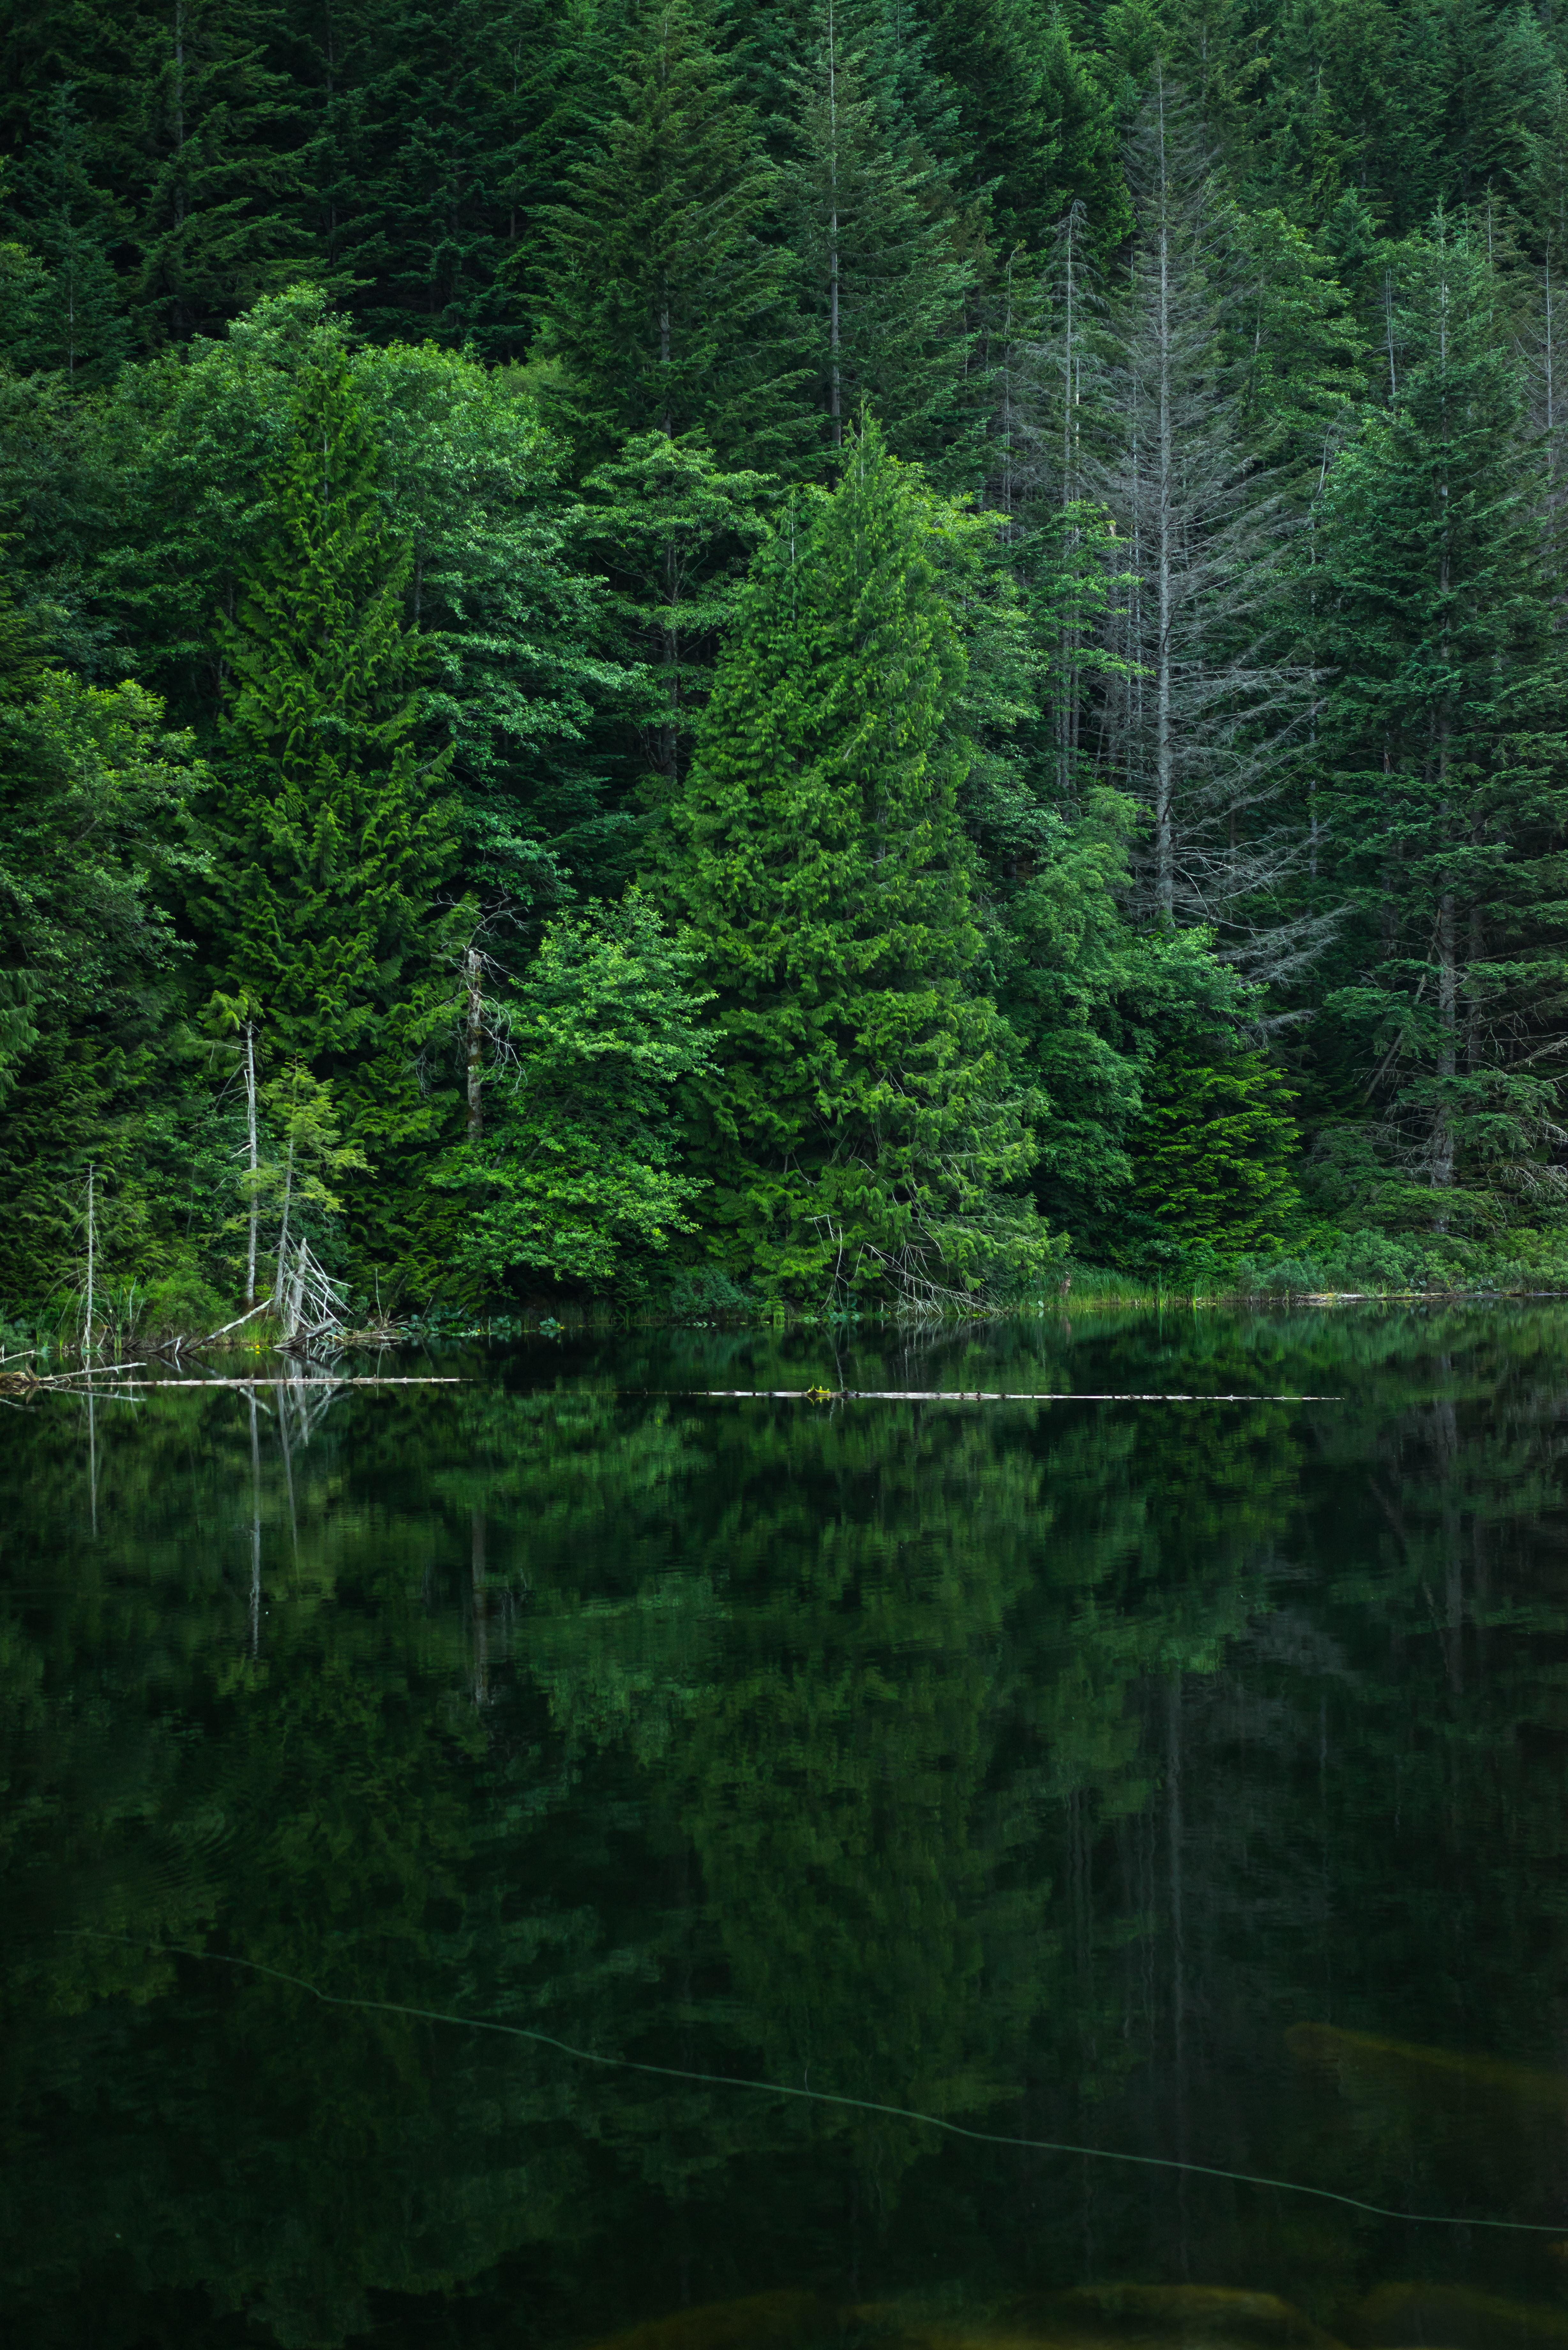 Afognak Island Forest Preservation - United States